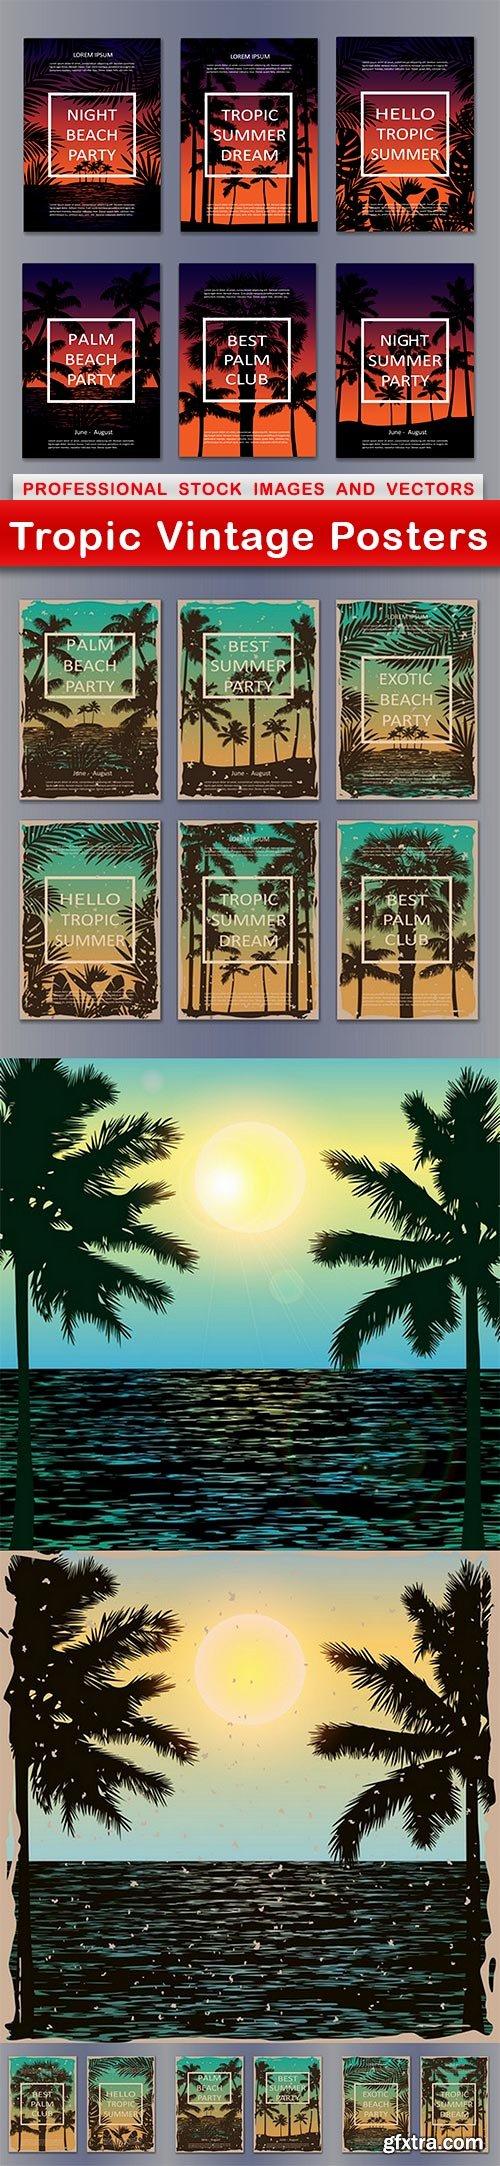 Tropic Vintage Posters - 7 EPS